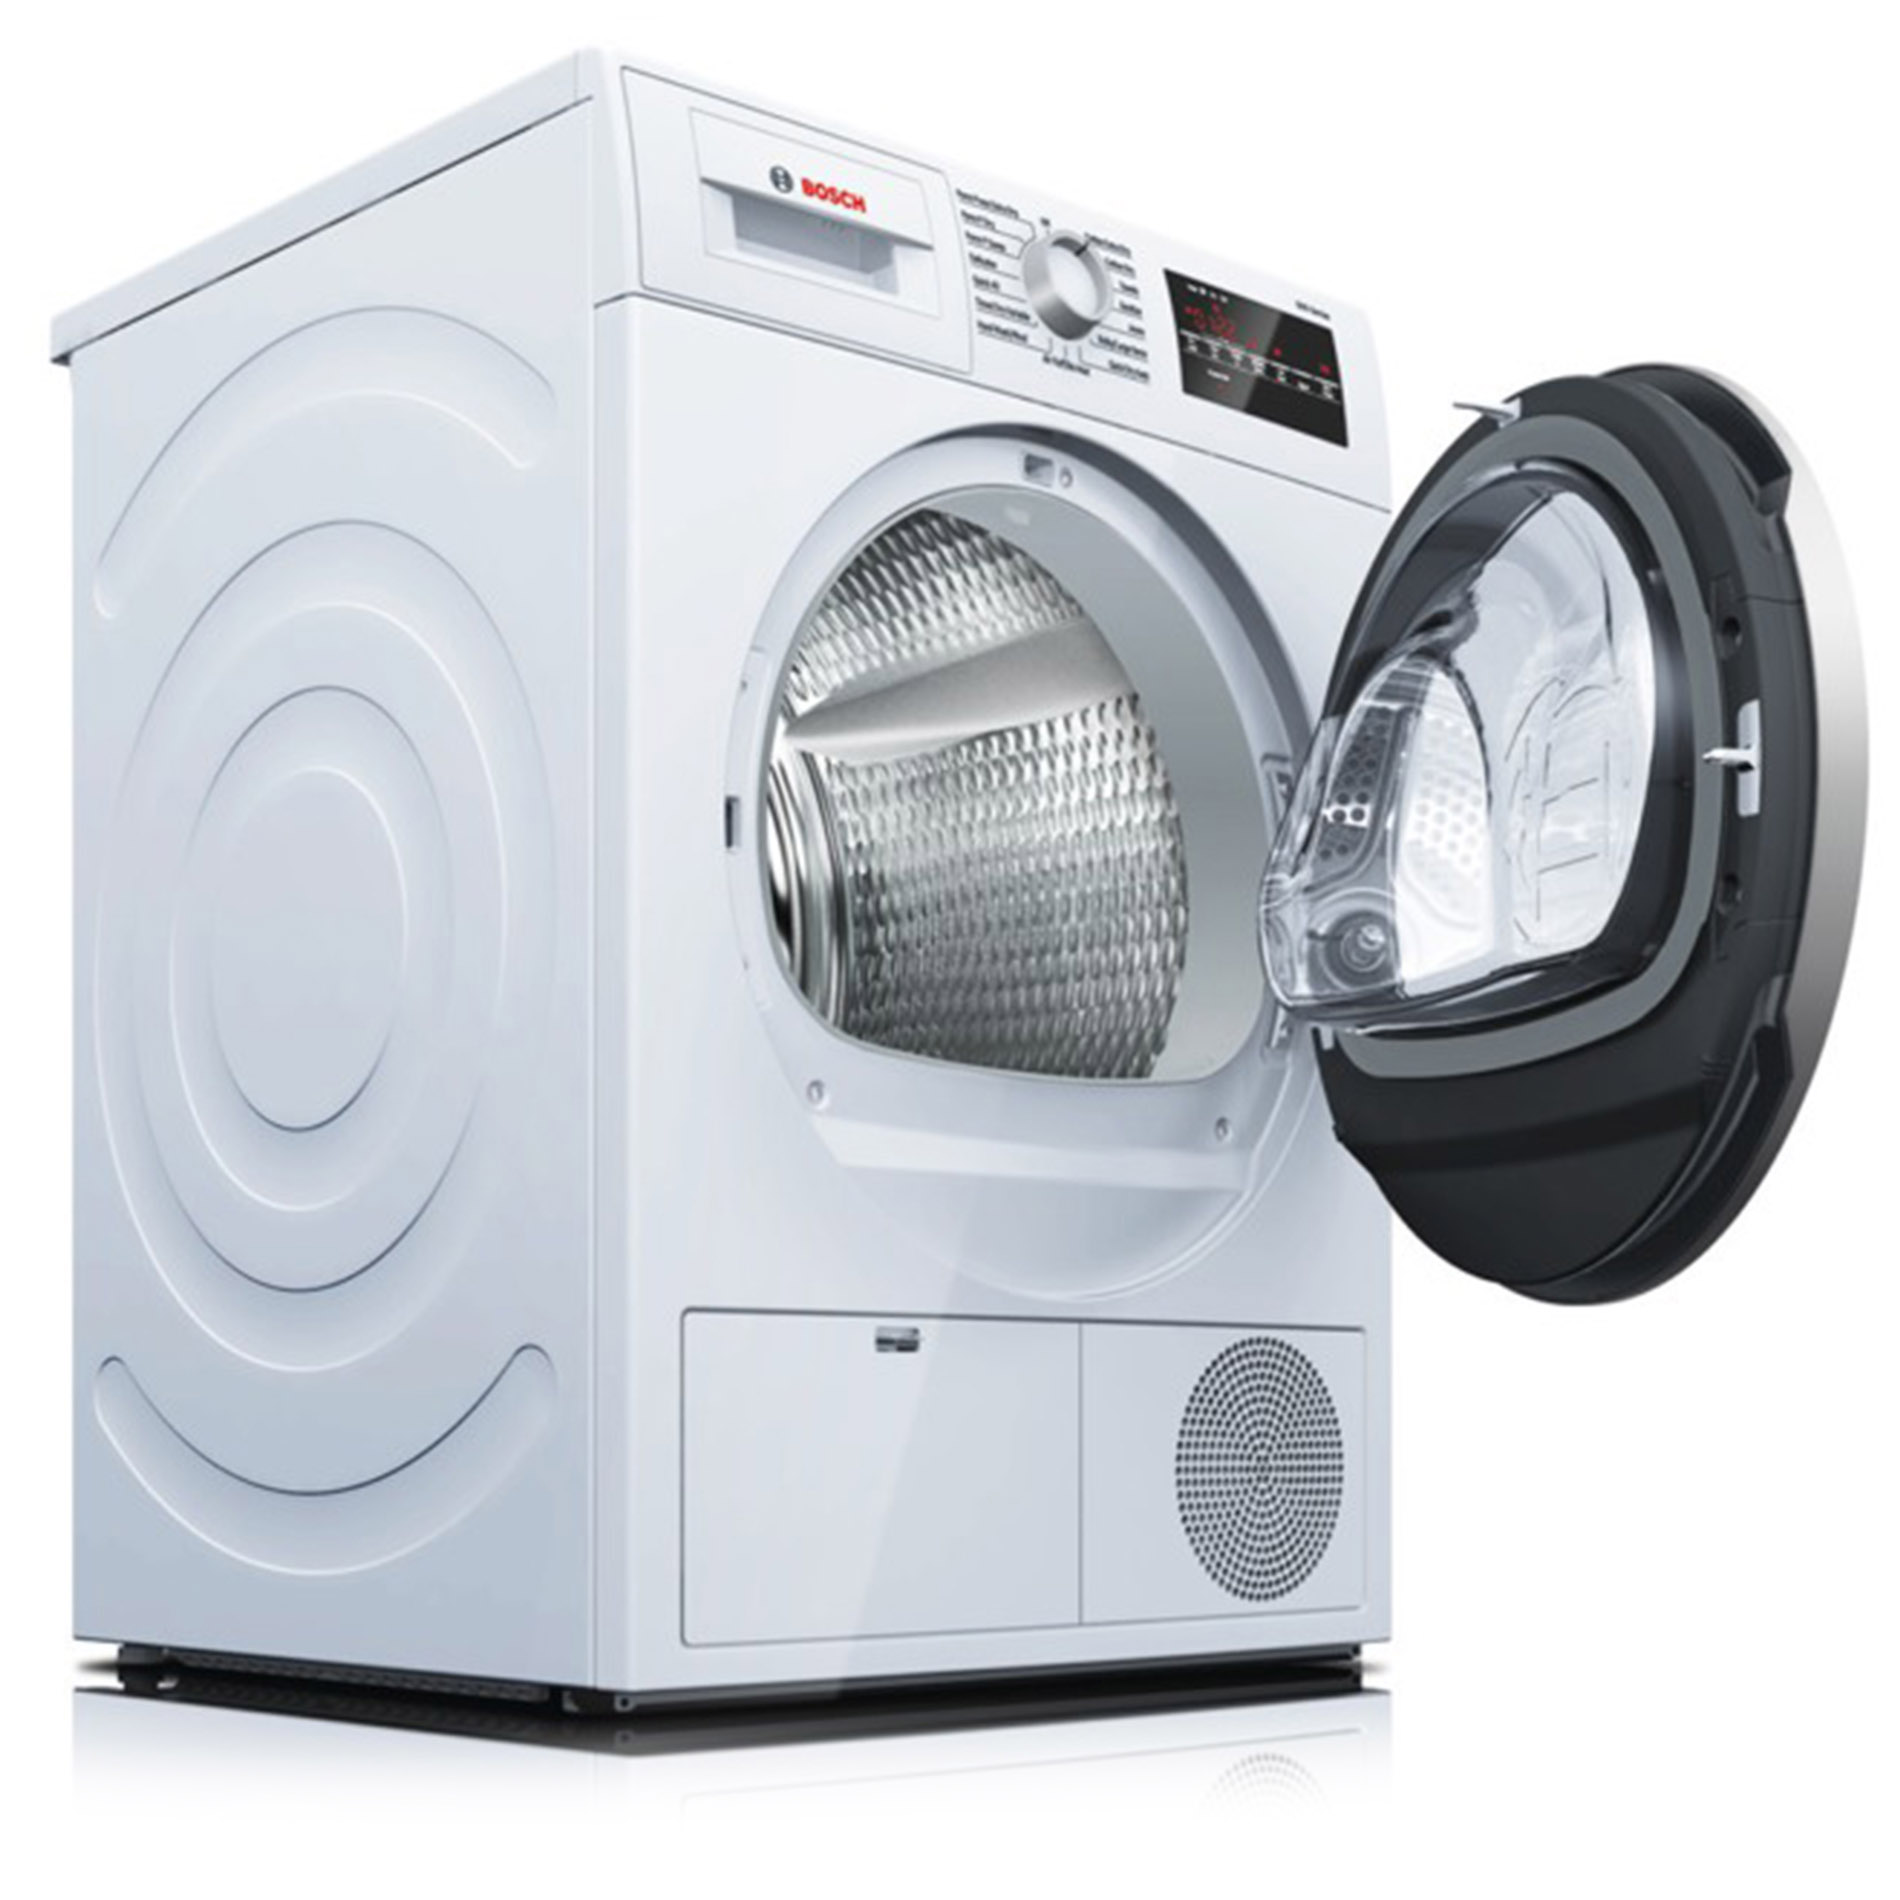 Bosch WTG86401UC 500 Series 4.0 cu. ft. Compact Condensation Dryer - White